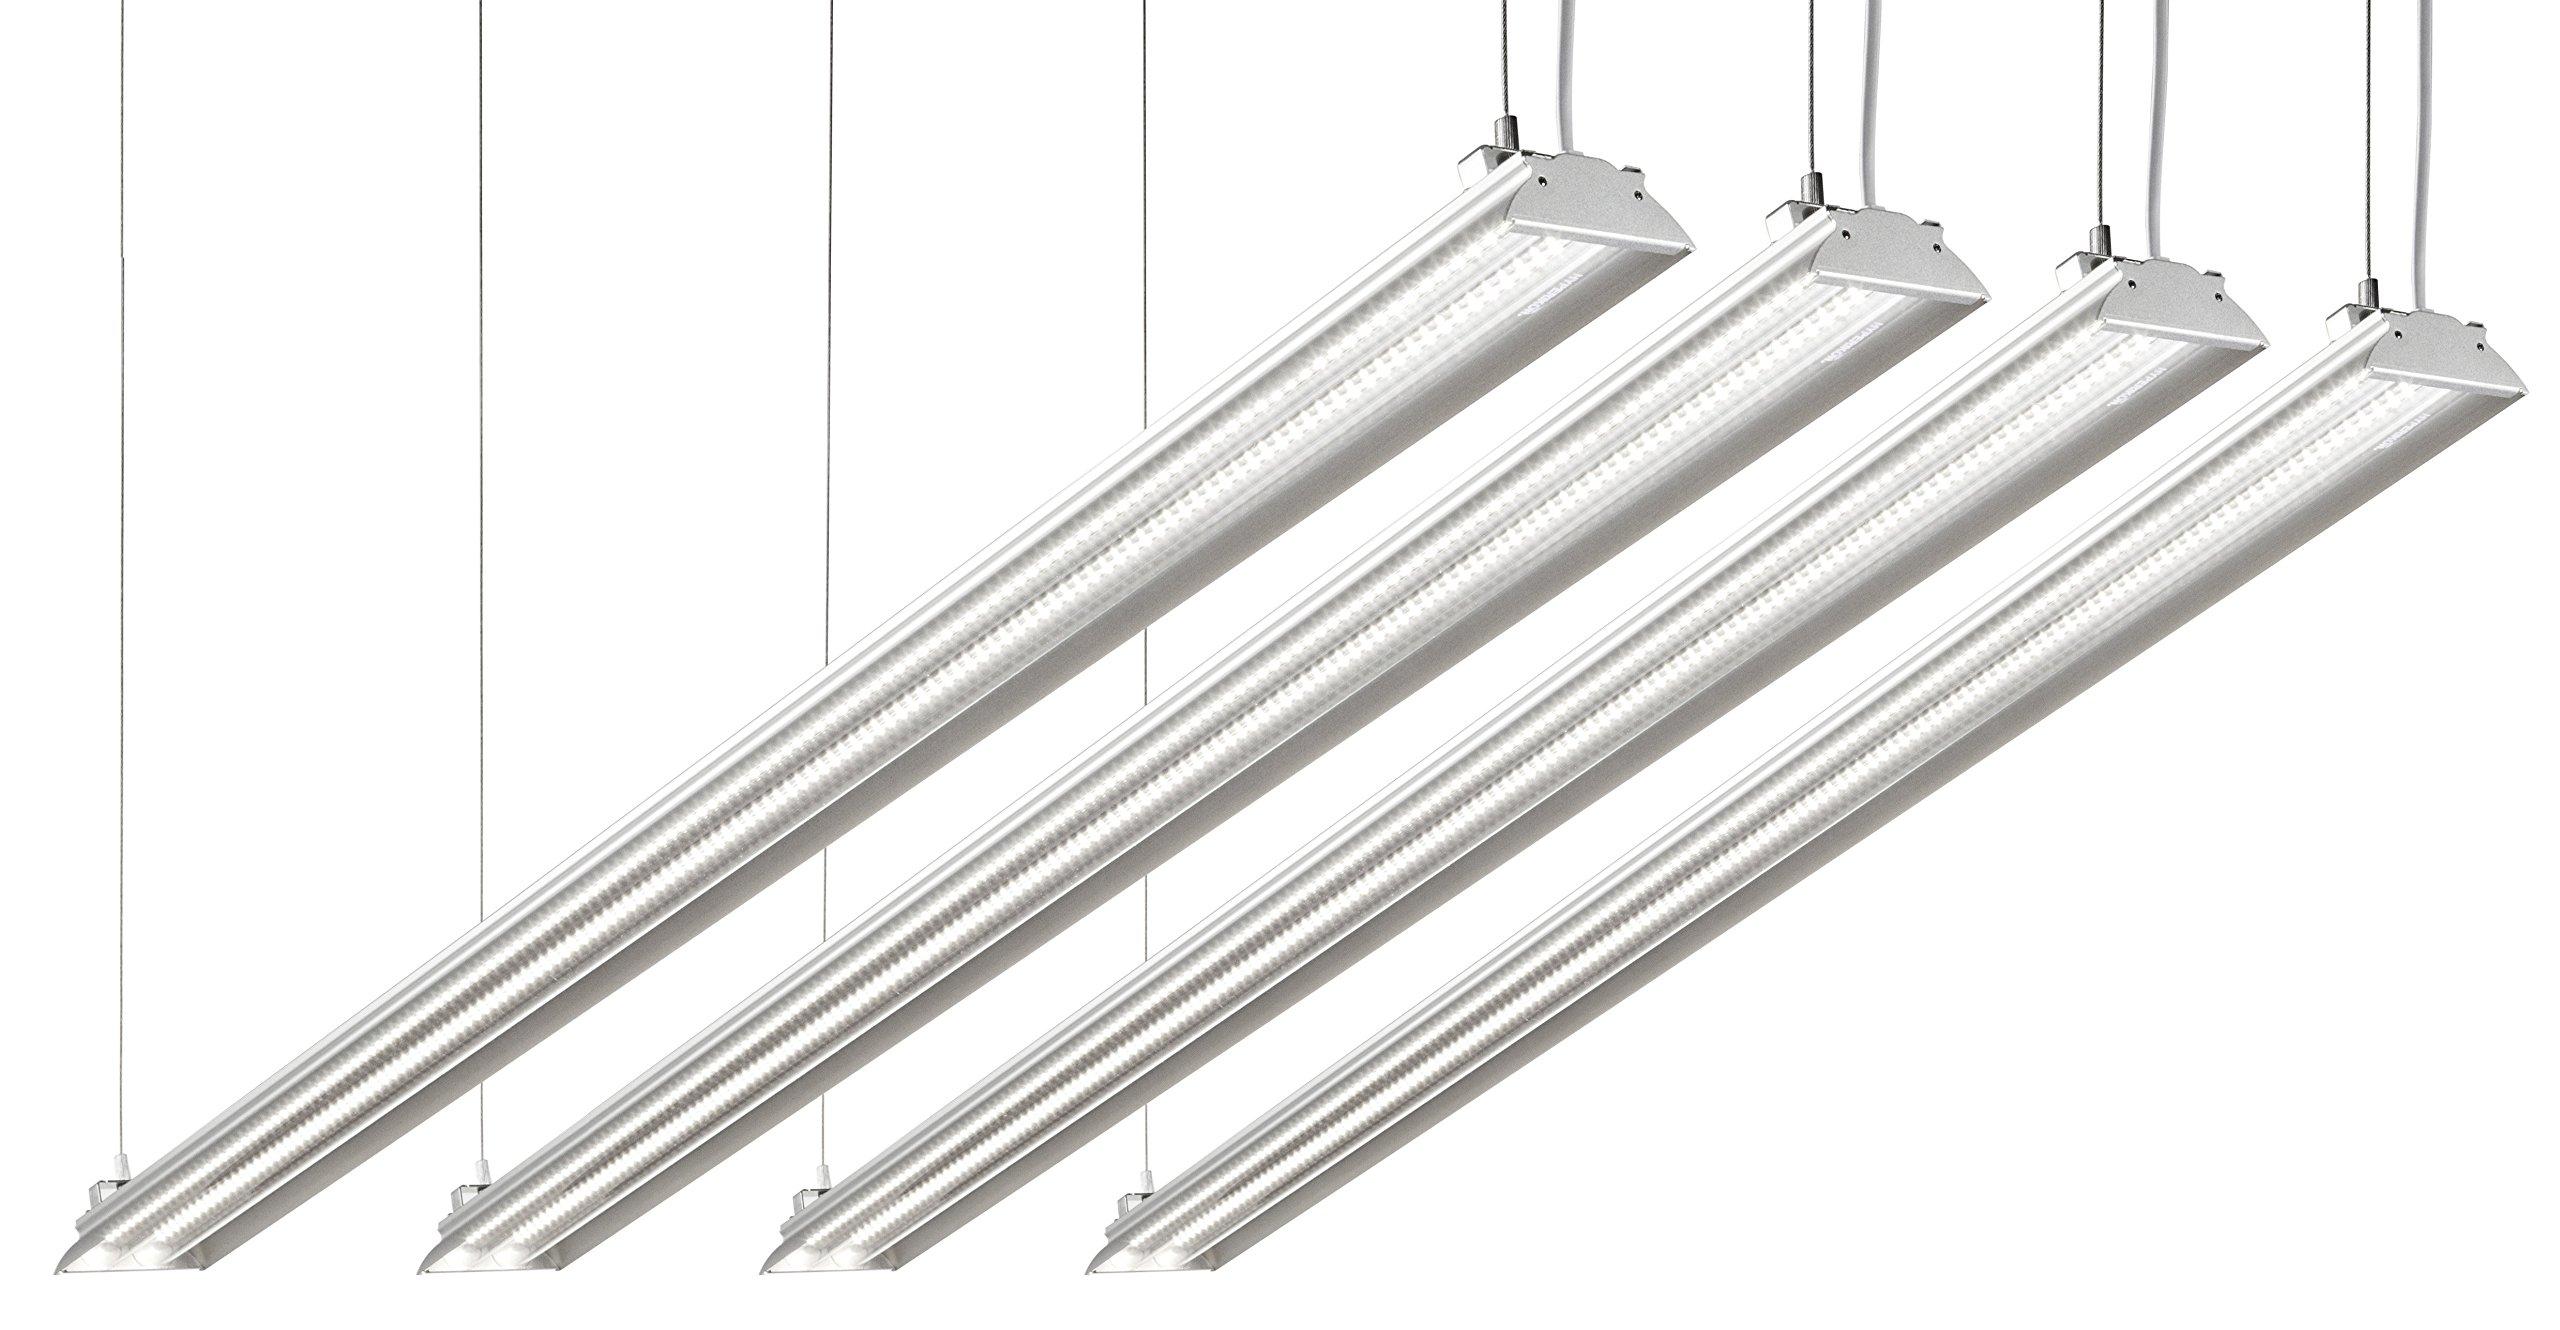 Hyperikon 4 Foot LED Shop Light, 100 Watt Replacement (35W), Shop and Garage Lighting, 4000K Daylight, Clear, UL, DLC, 4 Pack by Hyperikon